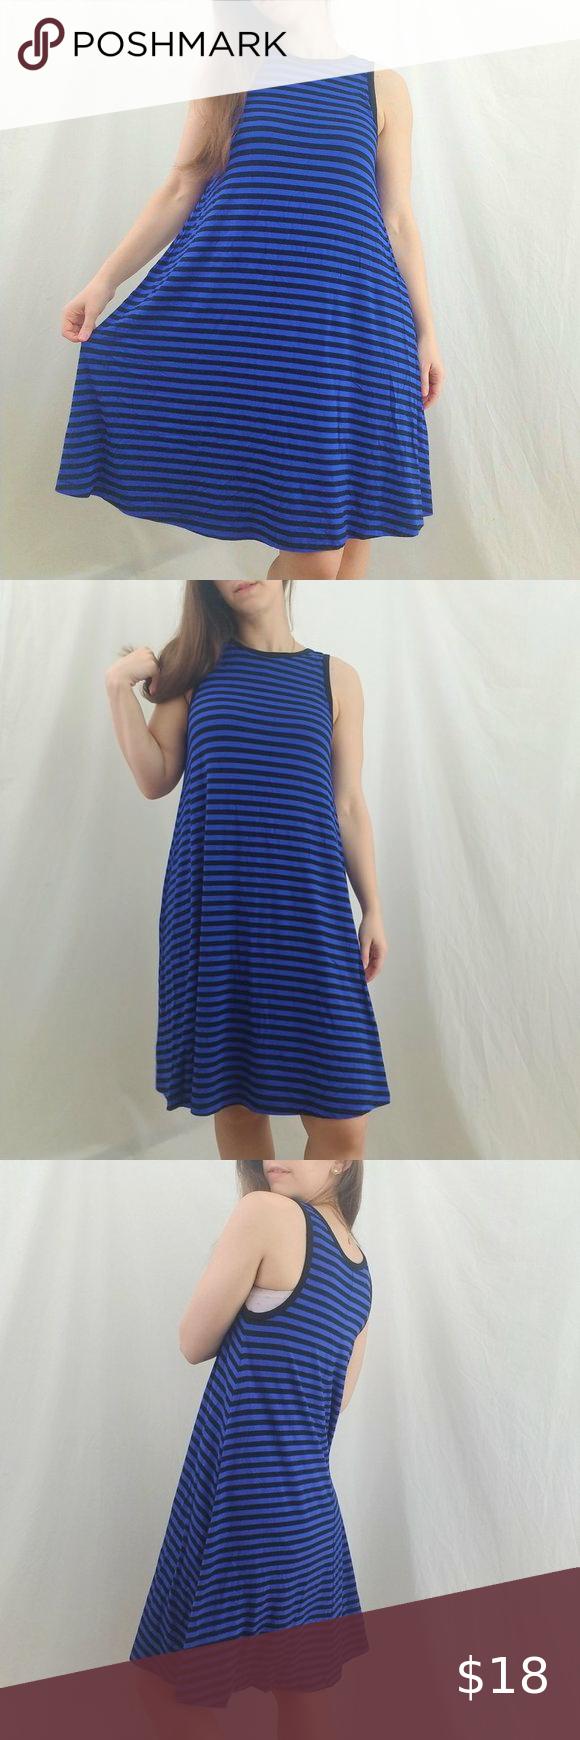 Old Navy Black And Blue Striped Midi Dress Striped Midi Dress Navy Midi Dress Dresses [ 1740 x 580 Pixel ]